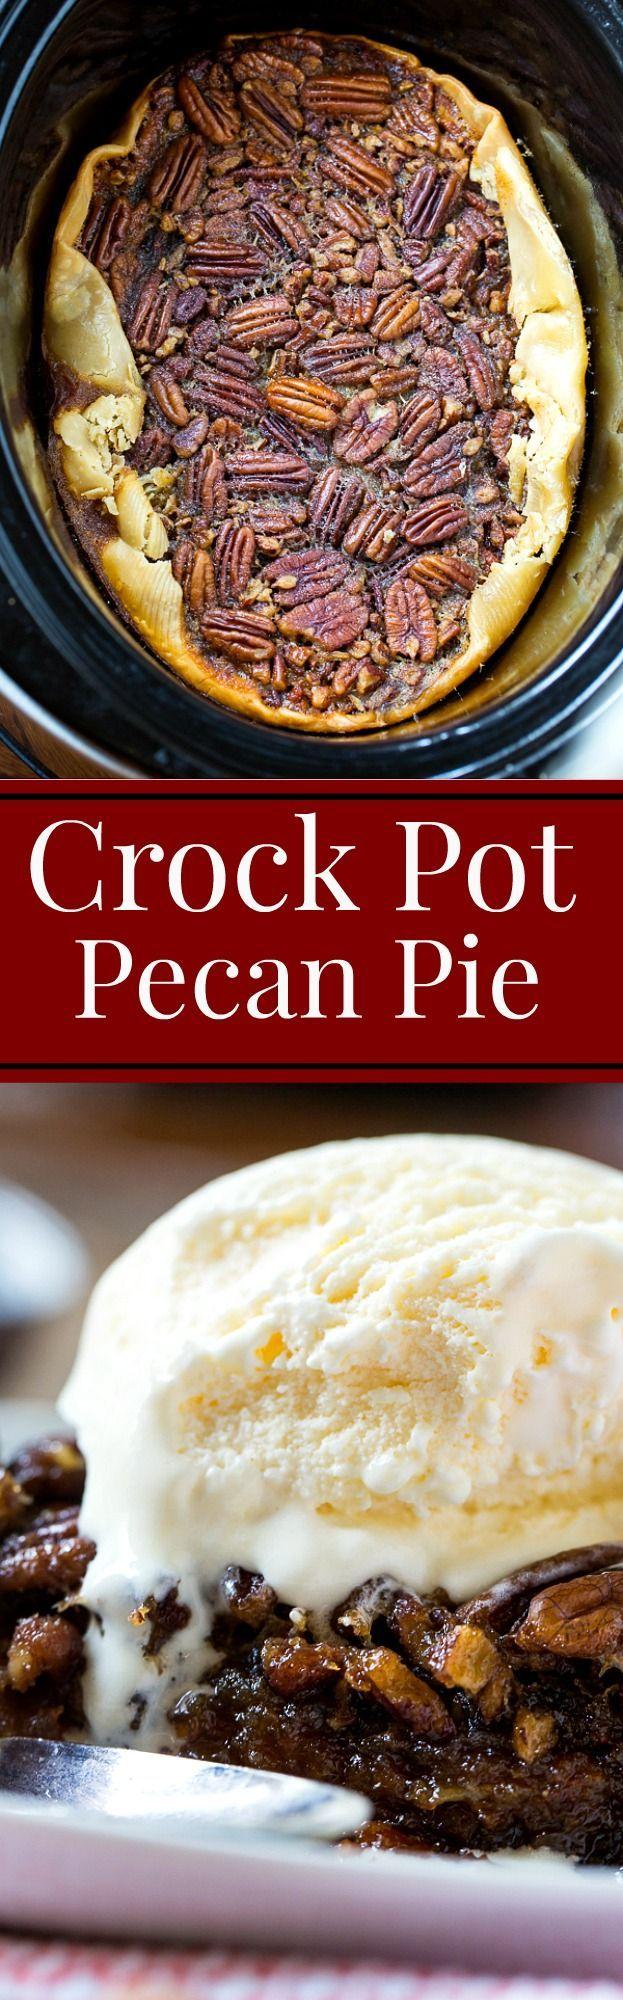 crock pot pecan pie recette slow cooking crock pot pinterest mijoteuse dessert et tarte. Black Bedroom Furniture Sets. Home Design Ideas